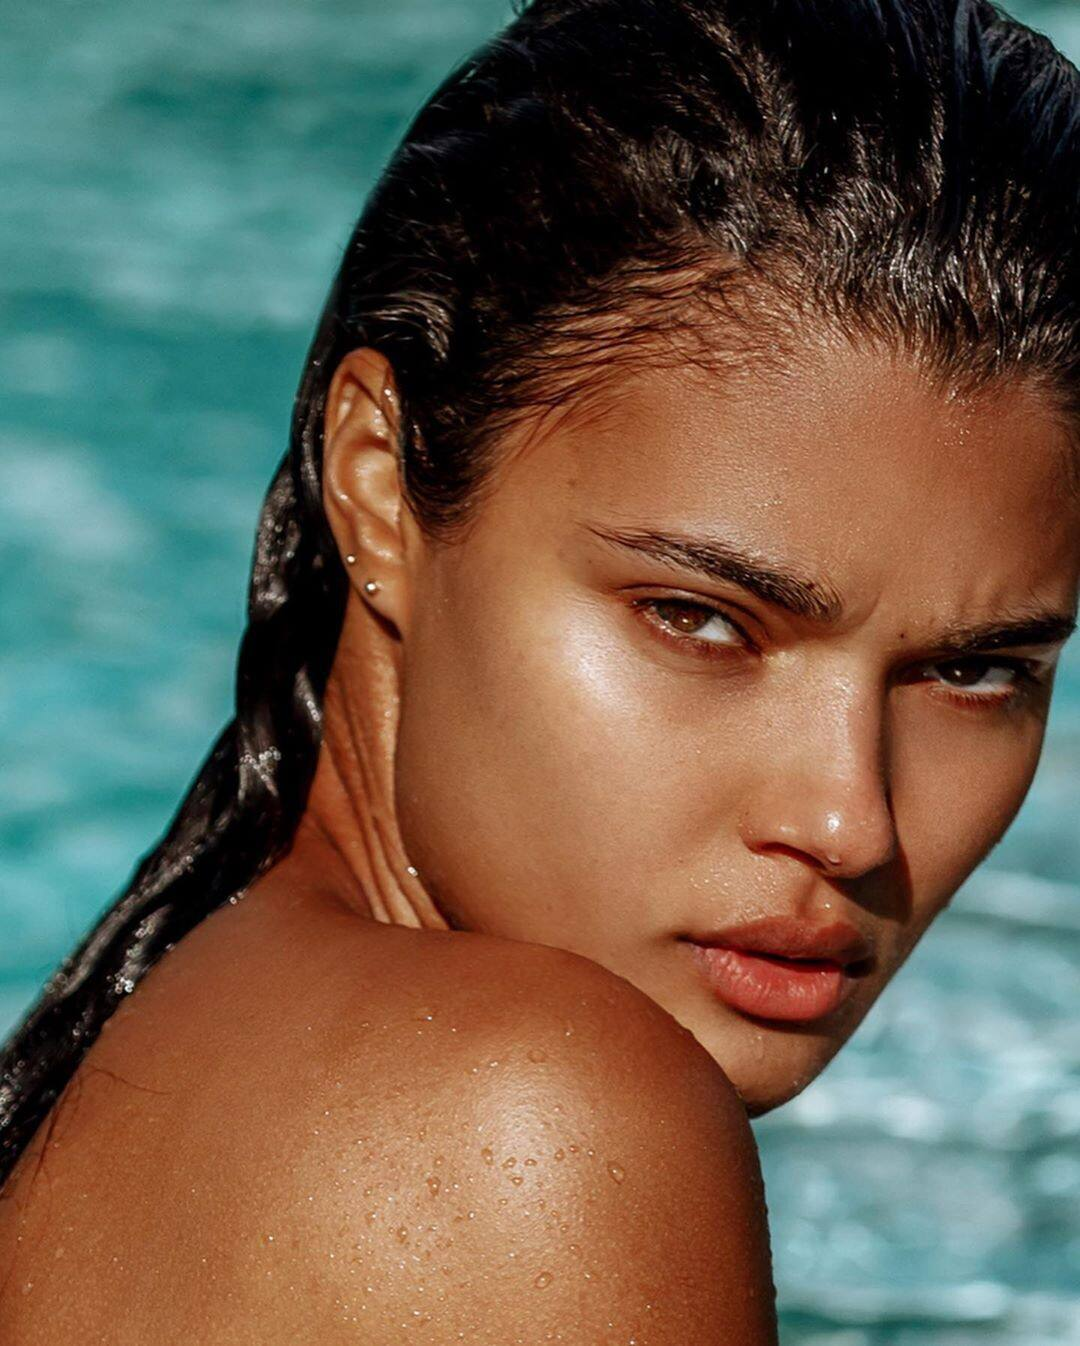 Daniela Braga – Hot Body In Sexy Instagram Pics 0003